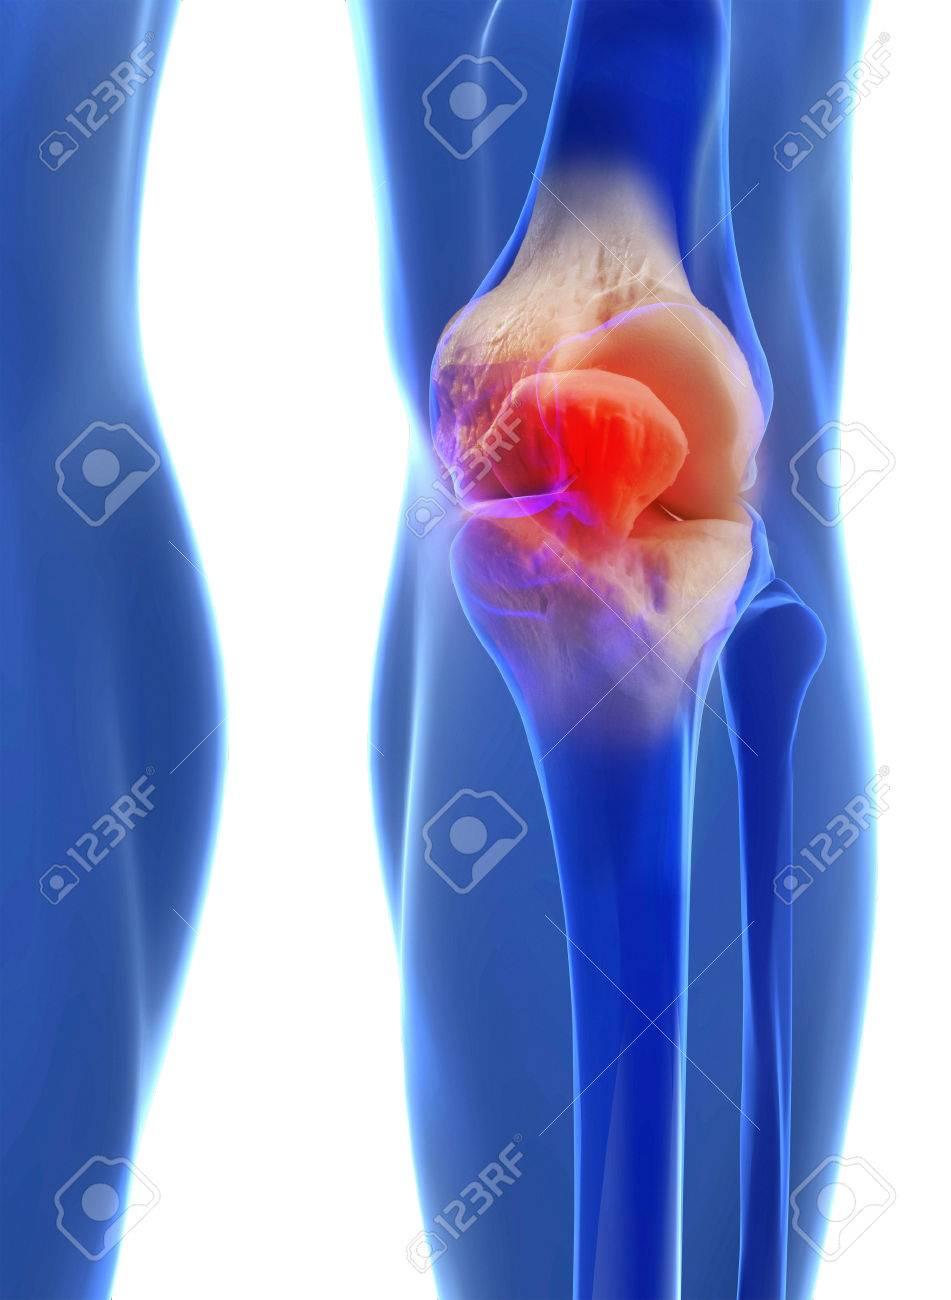 Human Knee Anatomy With Femur Tibia And Fibula Bones Under X Rays